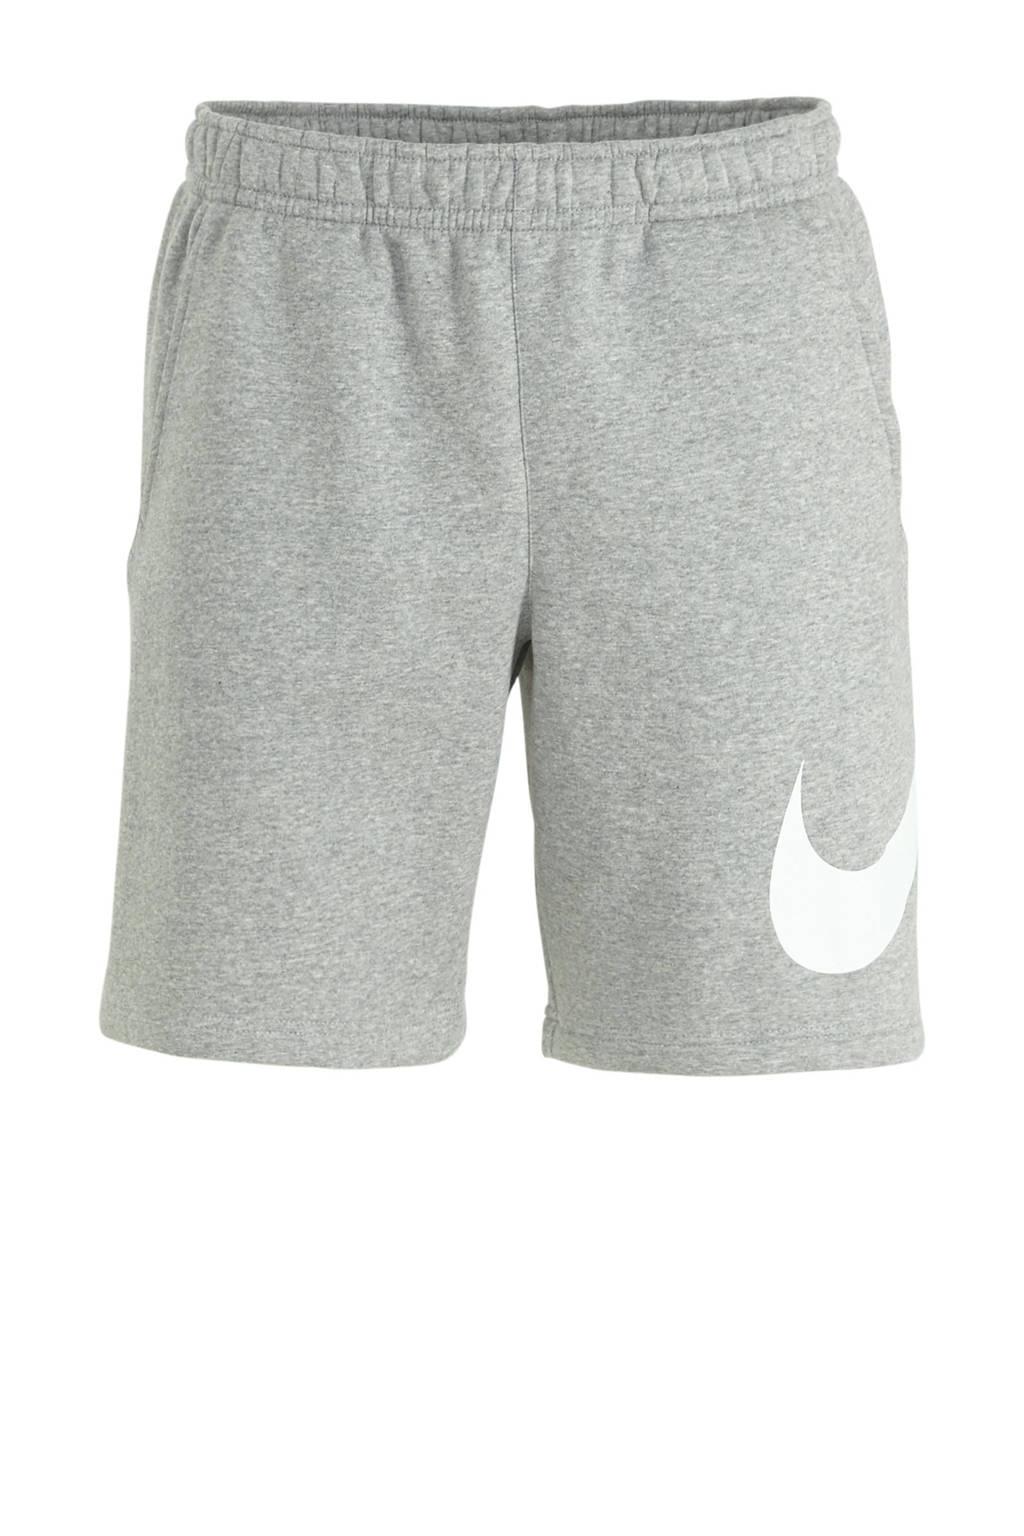 Nike   short lichtgrijs, grijs melange/wit/wit